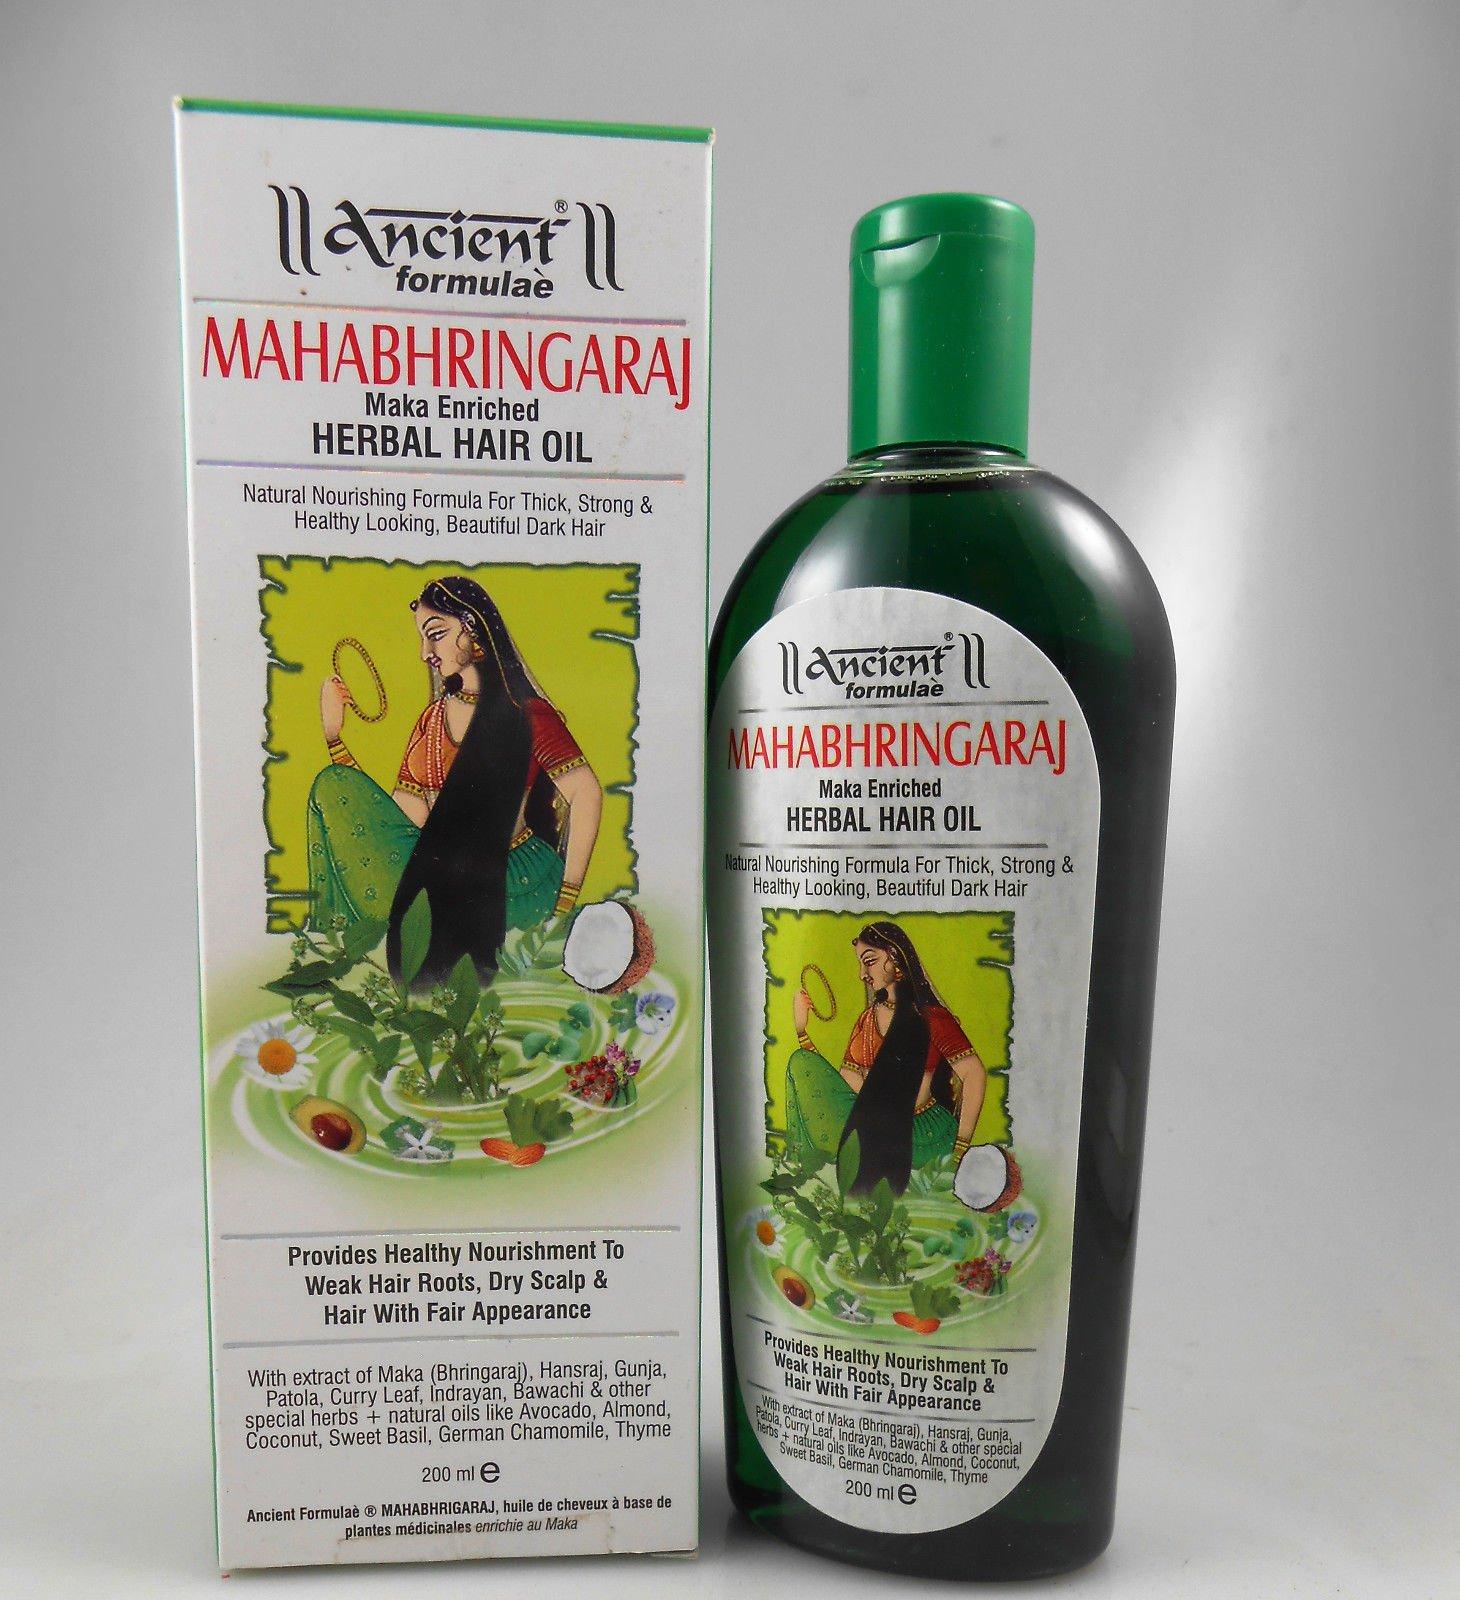 Hesh Ancient Formulae Mahabhringaraj (Maka Enriched) Herbal Har Oil 200ml